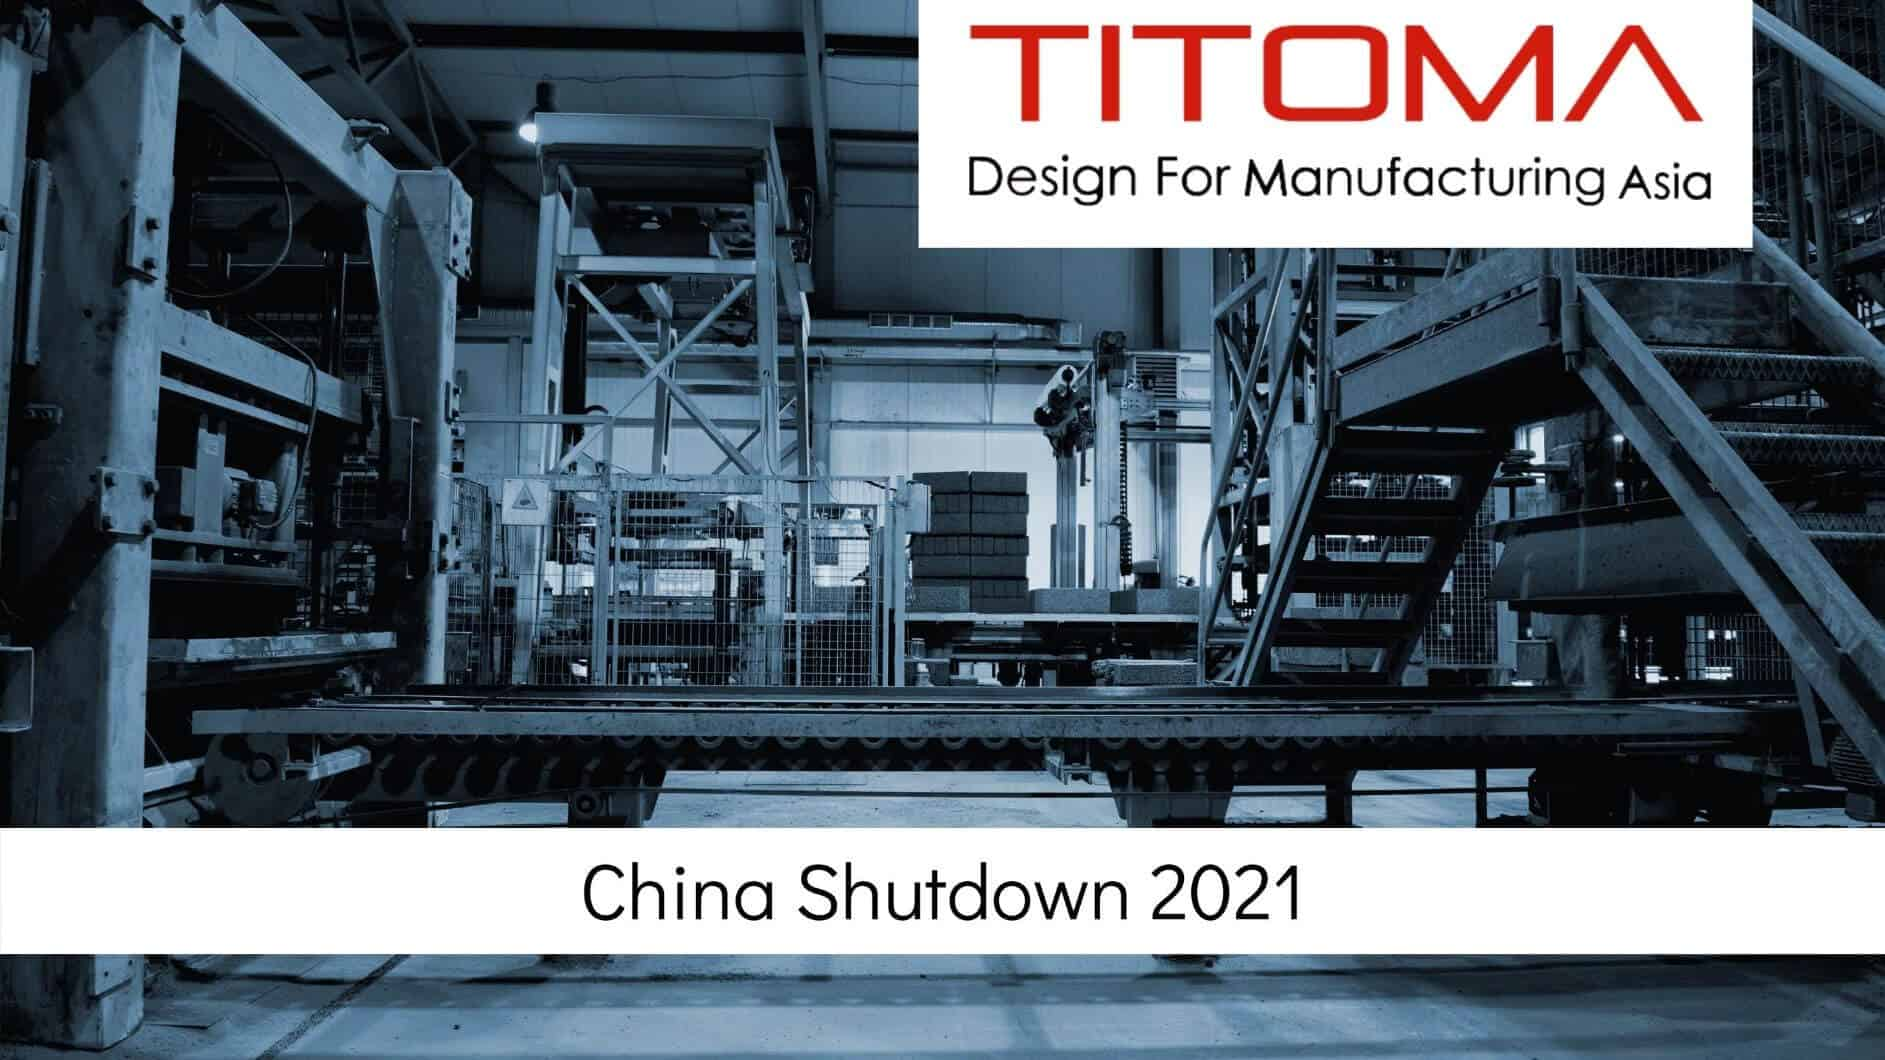 China shutdown 2021